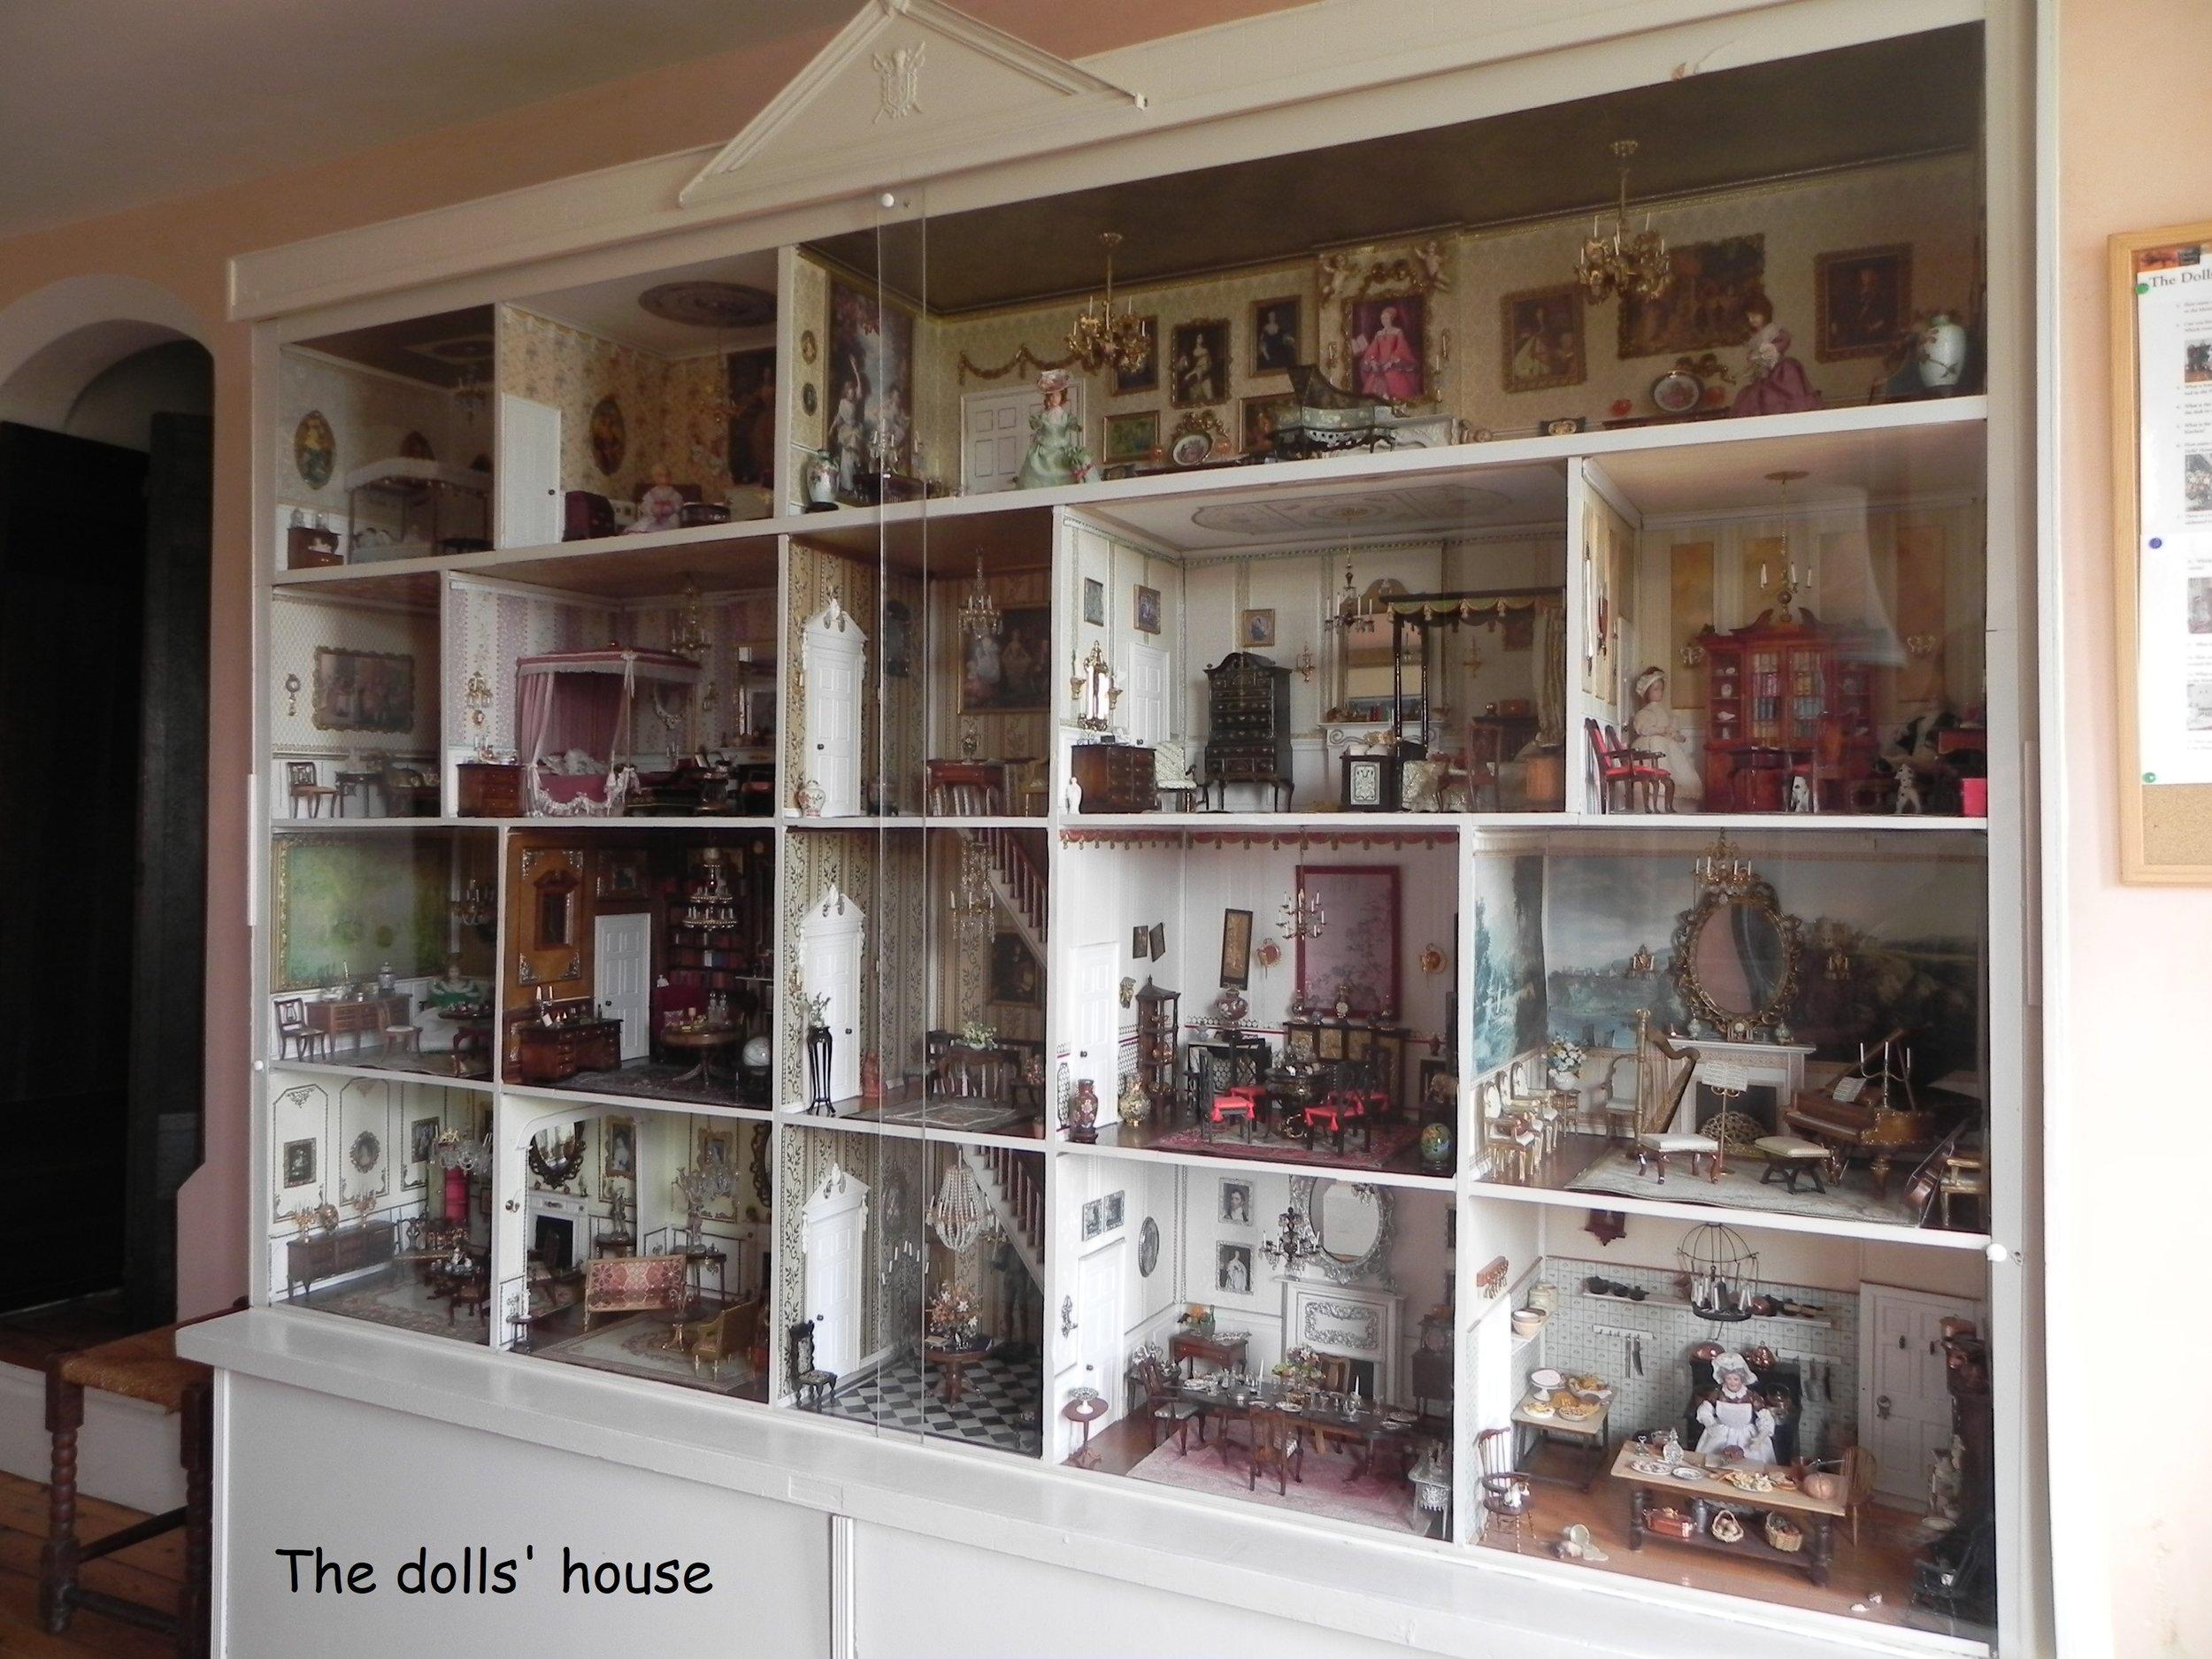 The dolls' house.jpeg